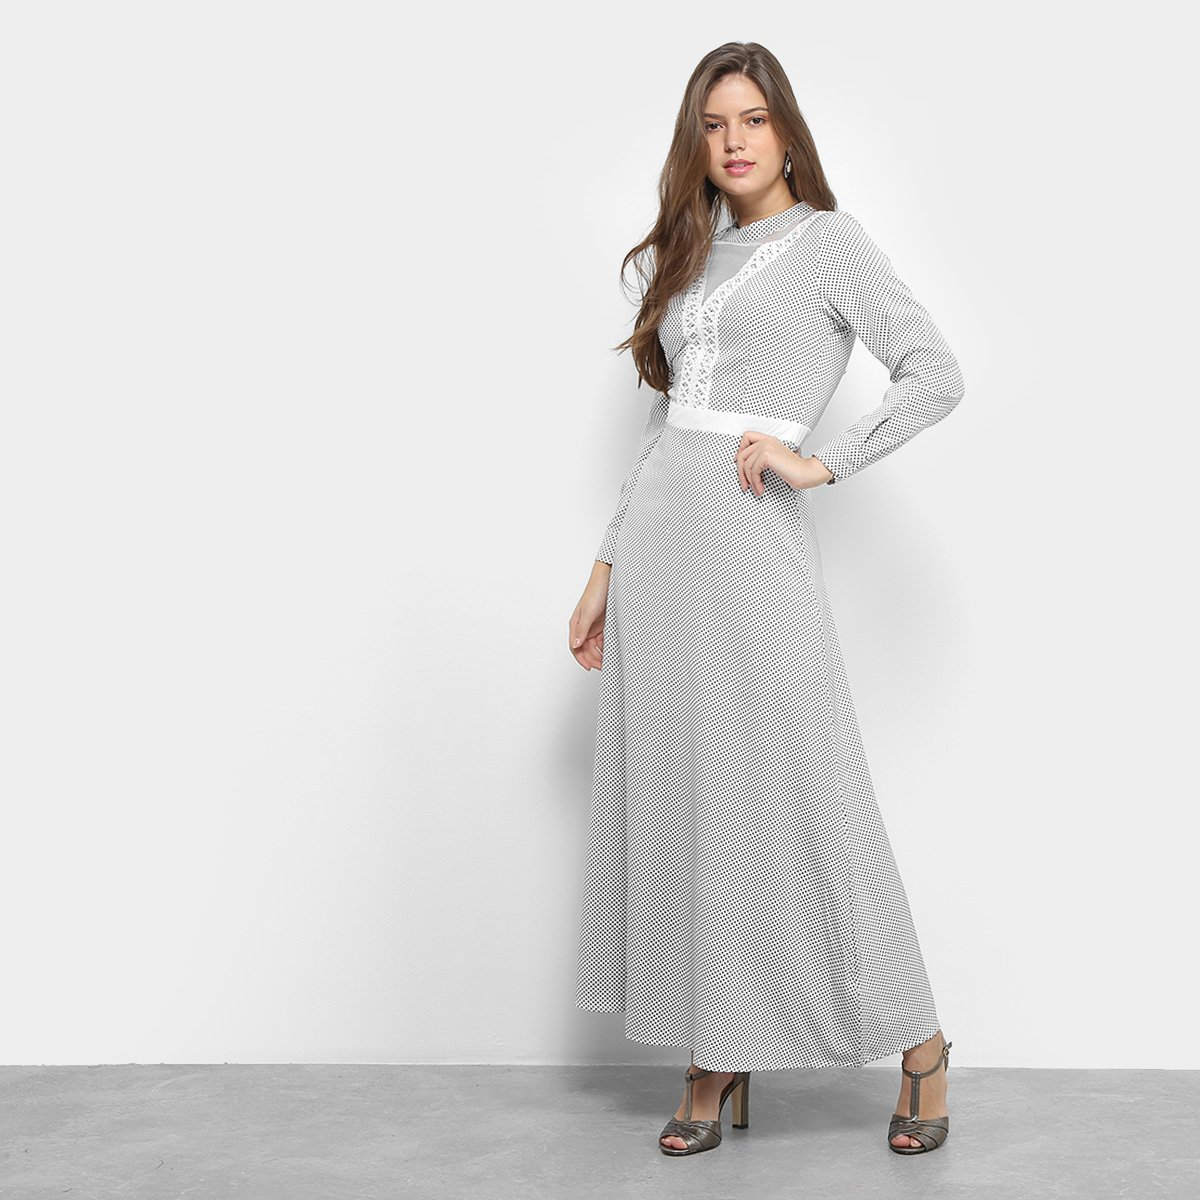 Vestido Only Fashion Longo Poá Renda Manga Longa Branco